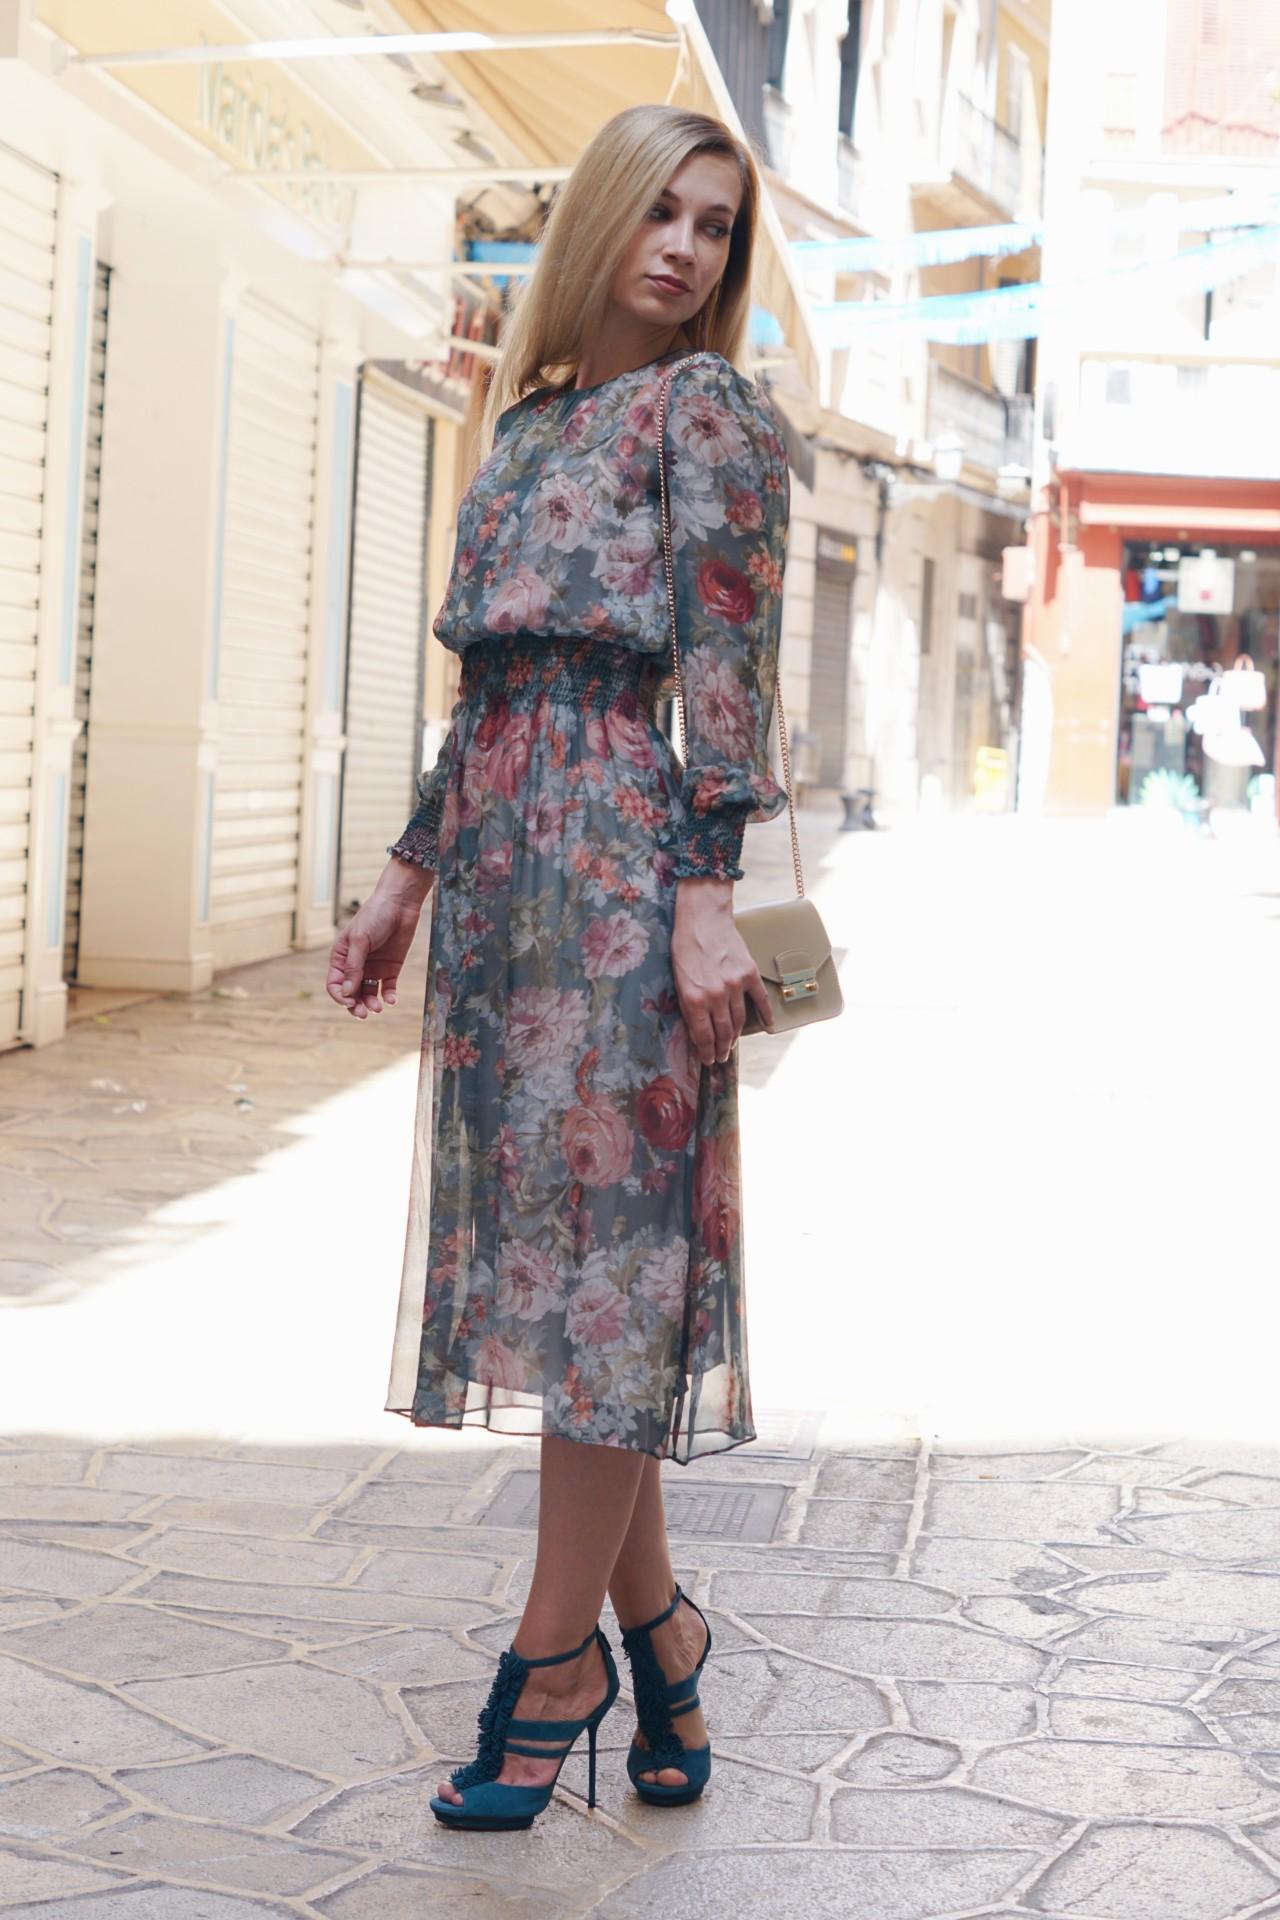 zara_dbkstylez_mallorca_mididress_gucci_fashionblog_мода_стиль_гуччи_фэшн